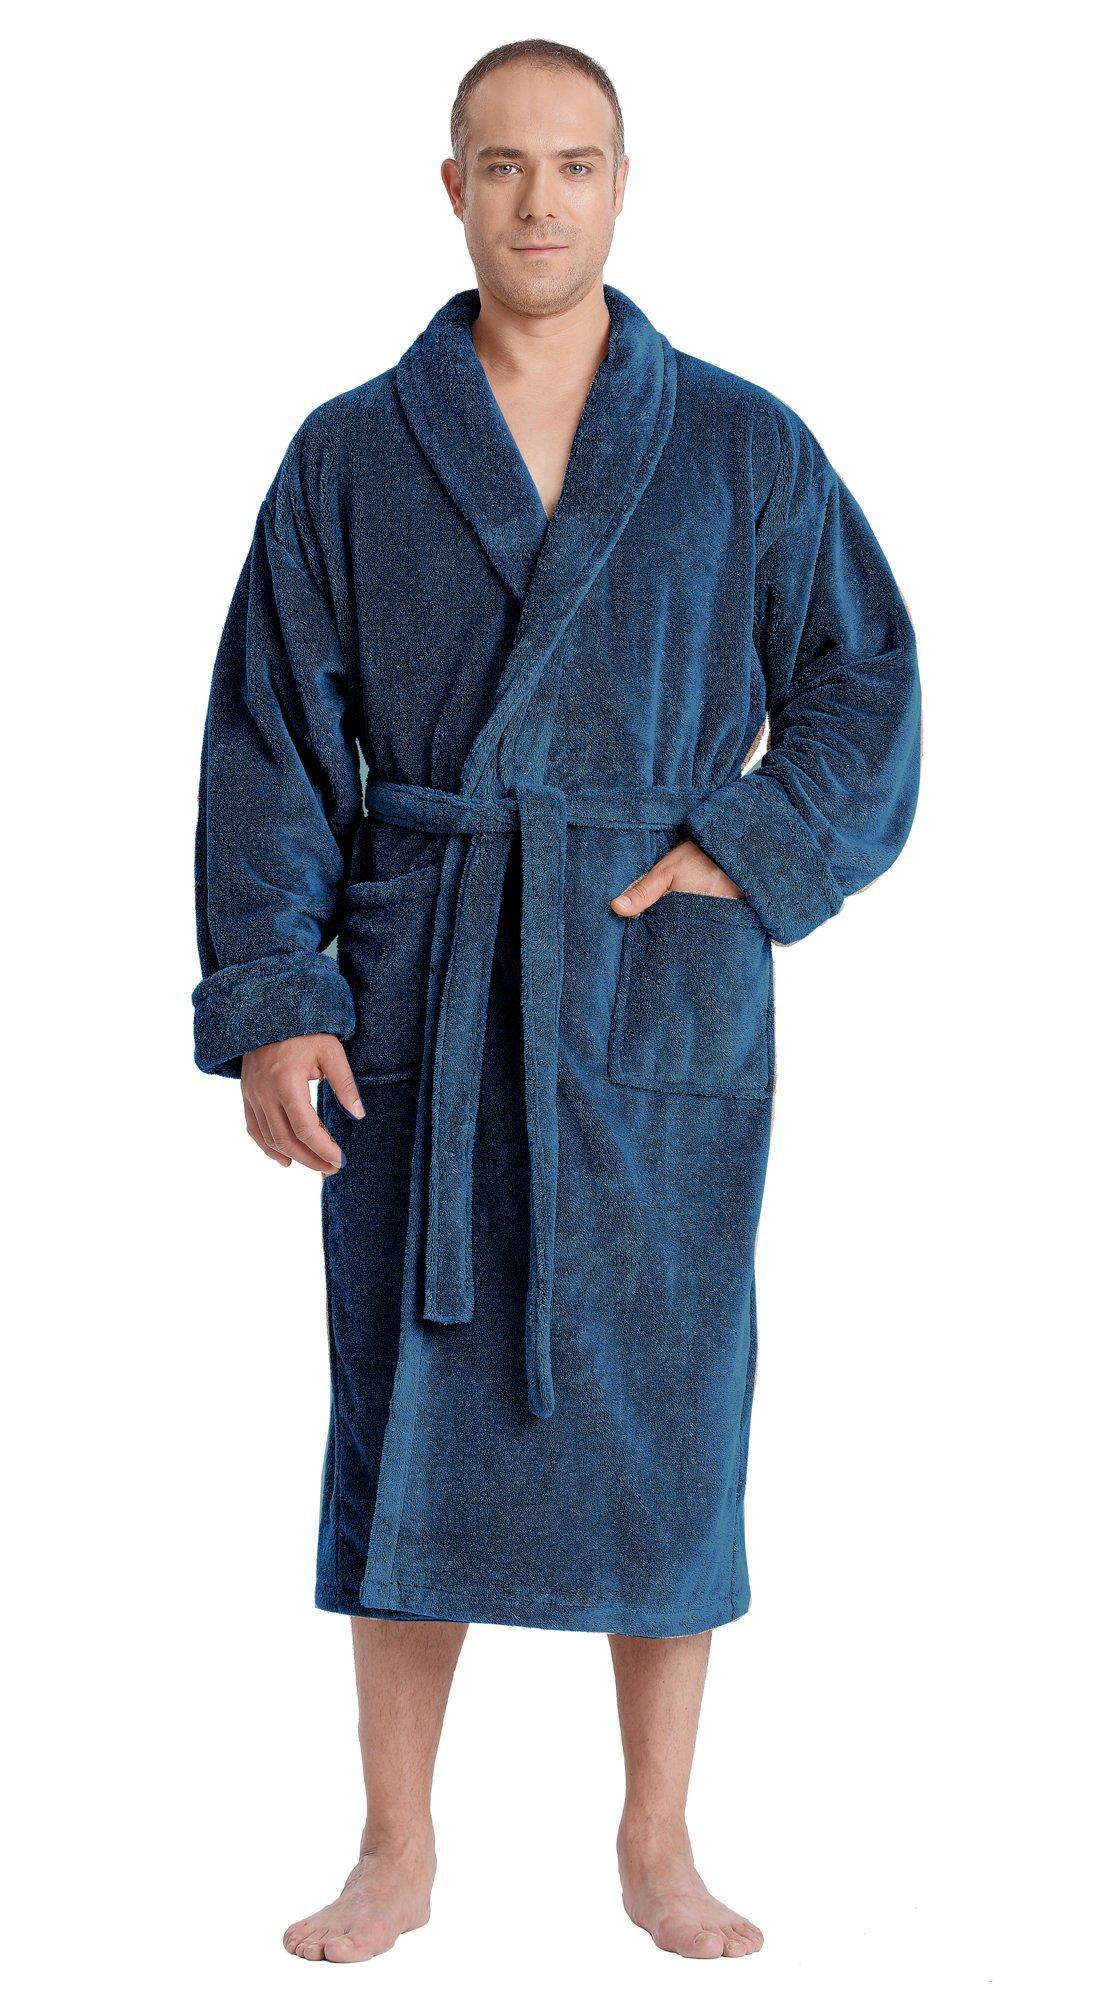 Arus Men's Satin Touch Shawl Fleece Bathrobe Turkish Soft Plush Robe Ocean Blue L/XL